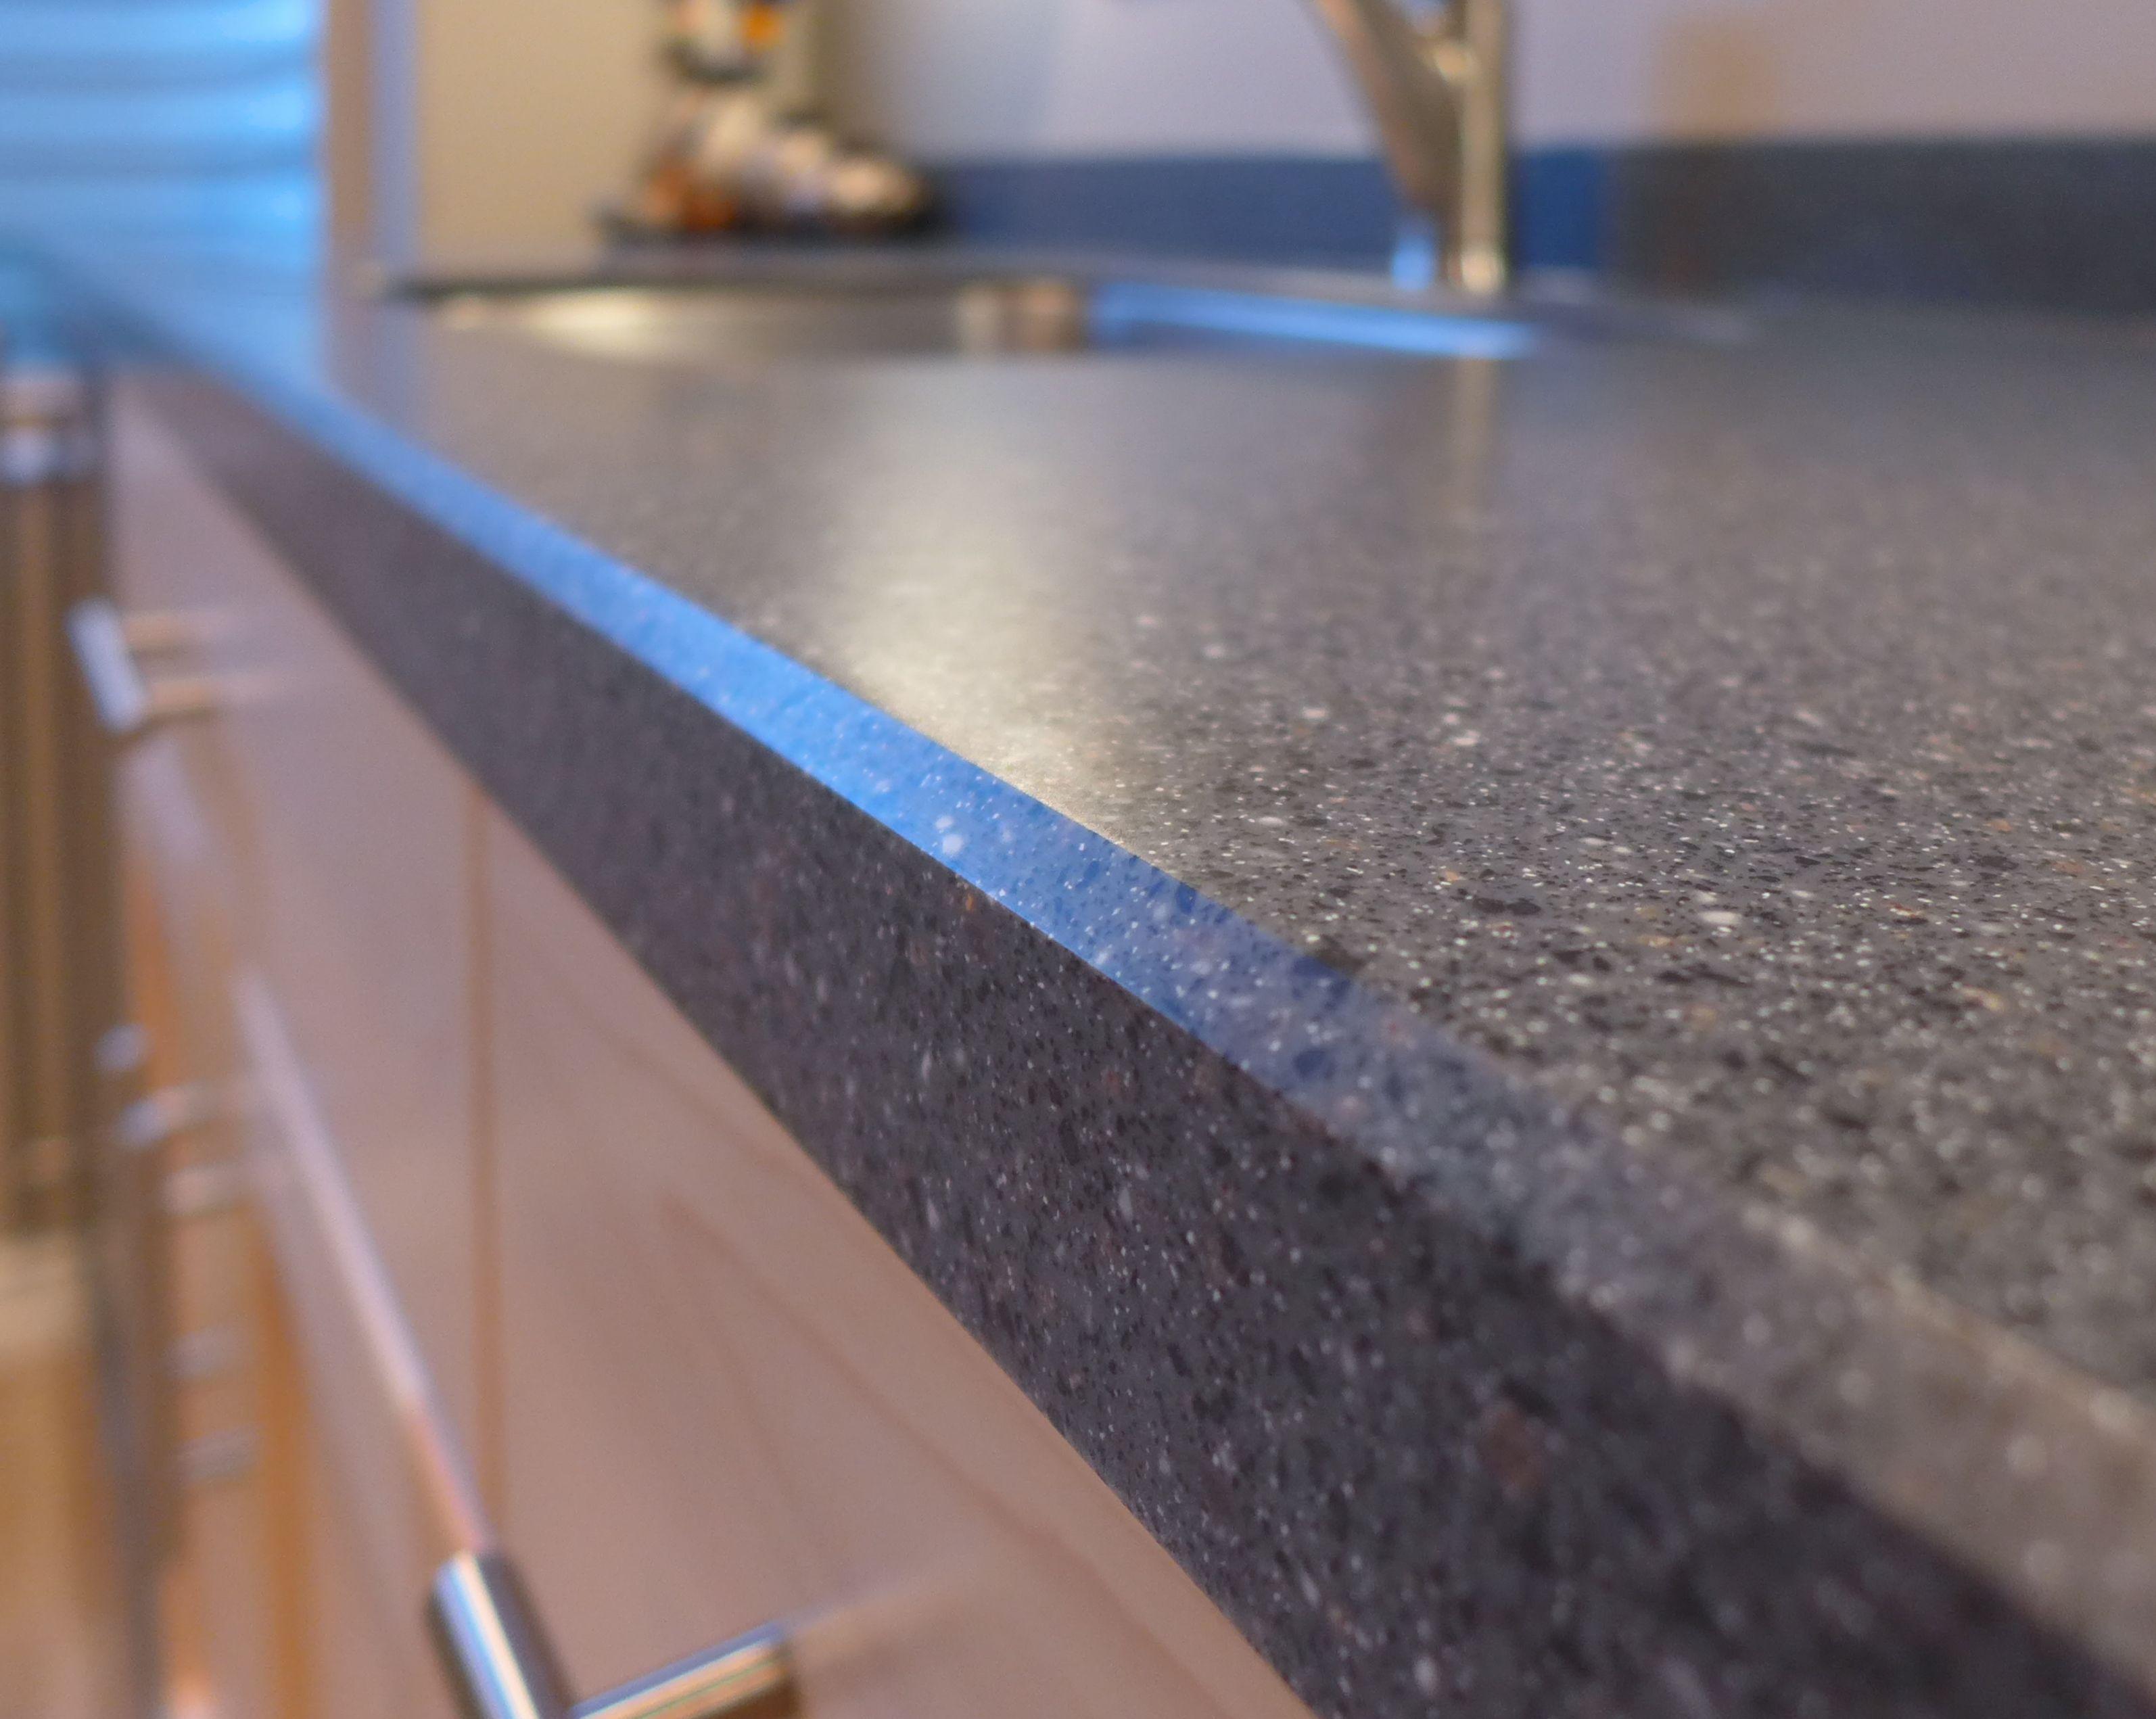 LG HI MACS Graphite Granite As Part Of The Hi Macs ALL STAR Program